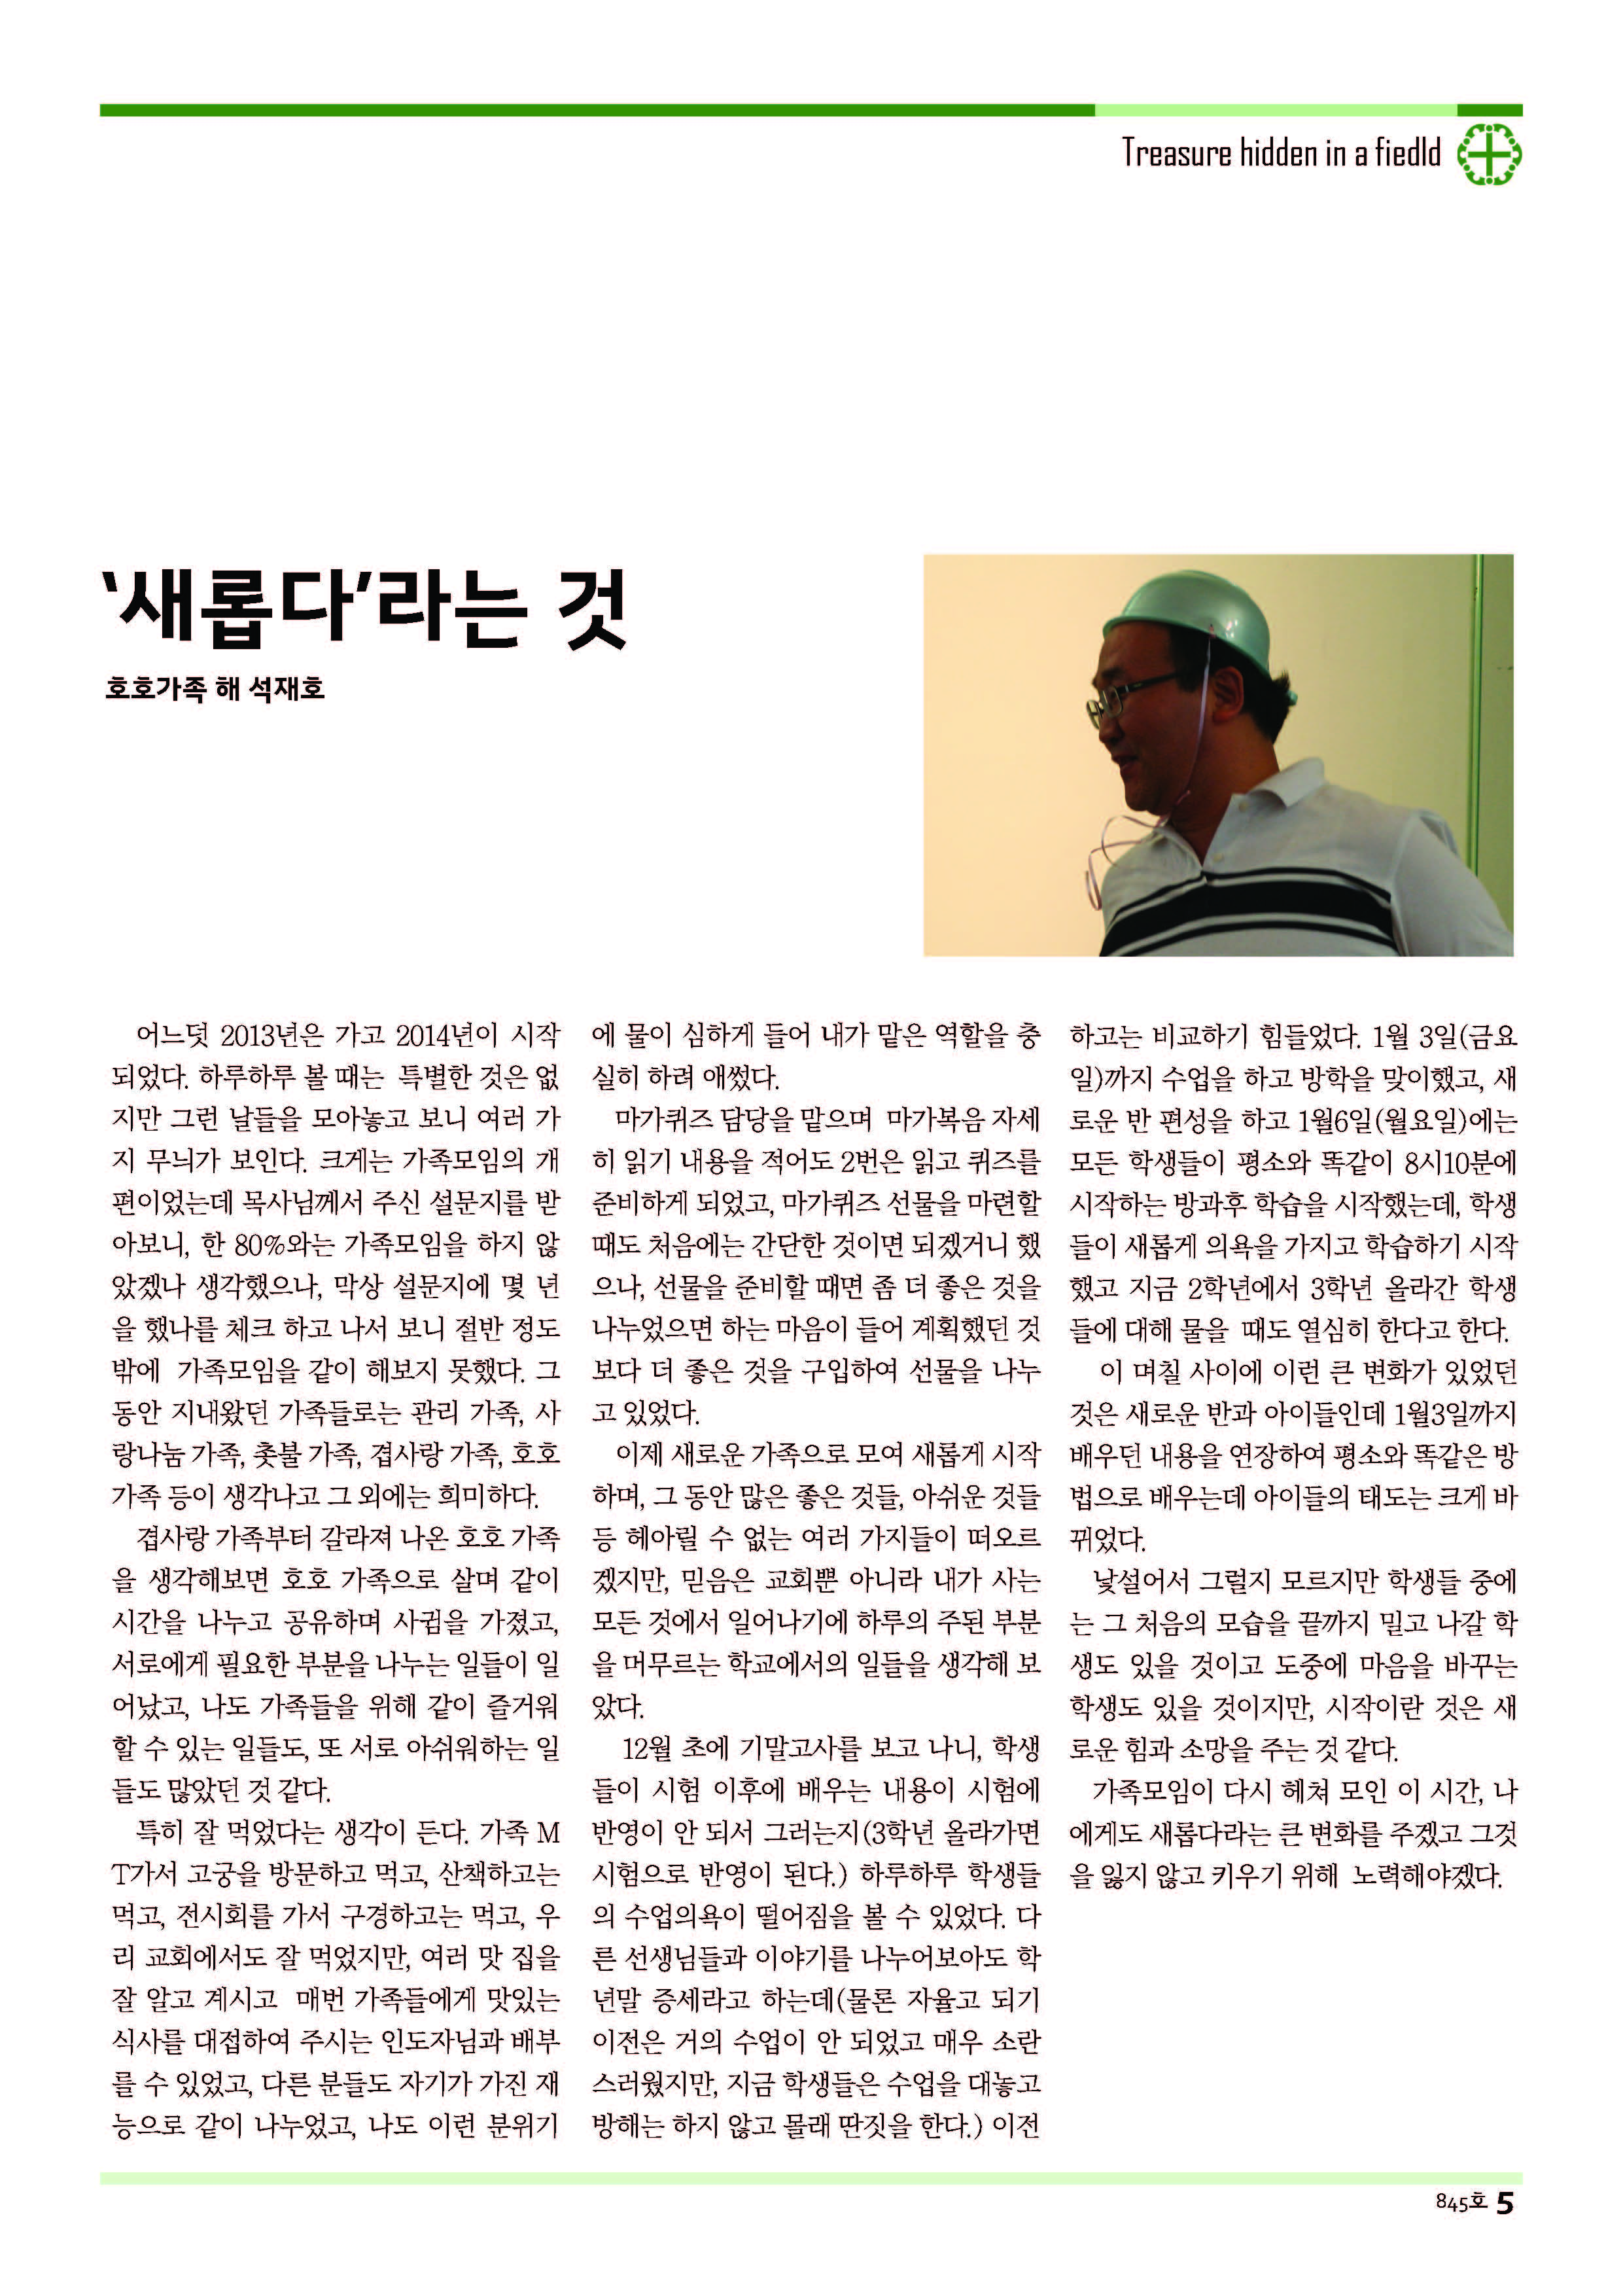 14sdjb0112_페이지_05.jpg